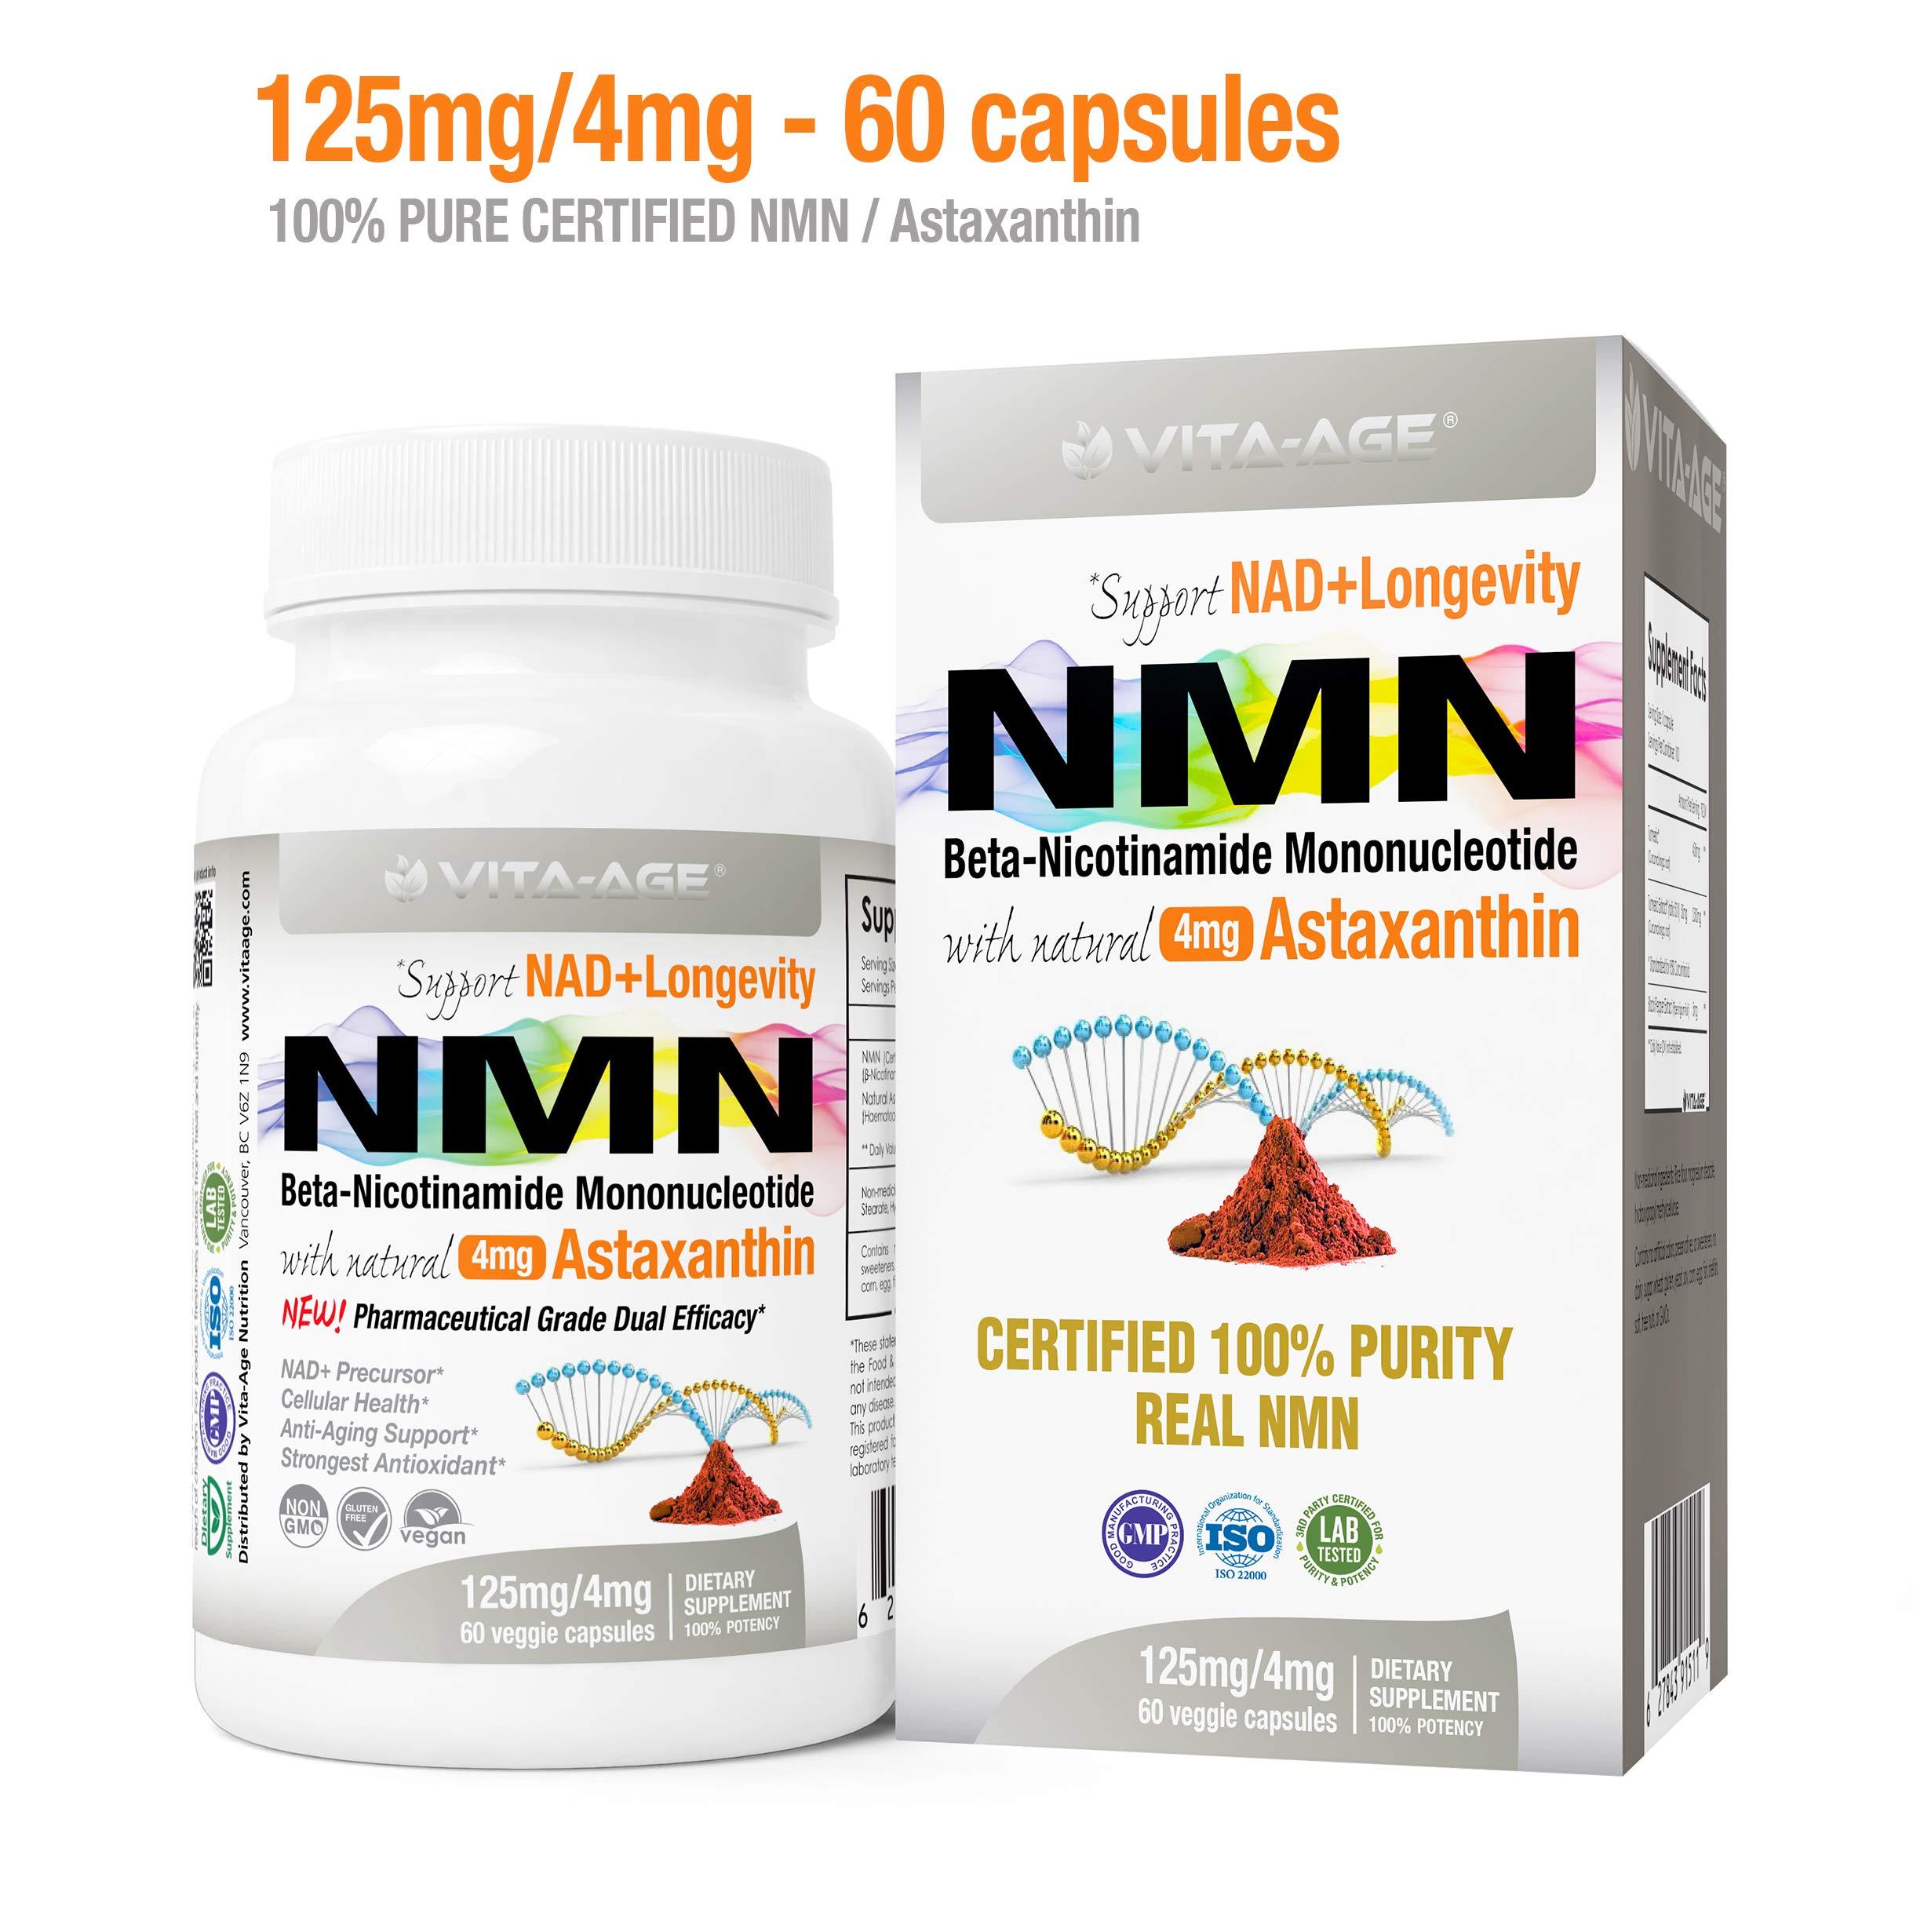 (1 x NMN 60 Capsules 125mg) Vita-Age Certified NMN β- Nicotinamide Mononucleotide + Astaxanthin - Sirtuin Activation Anti-Aging DNA-Repair Energy+ (NAD+ Antioxidants Detox Bundle)